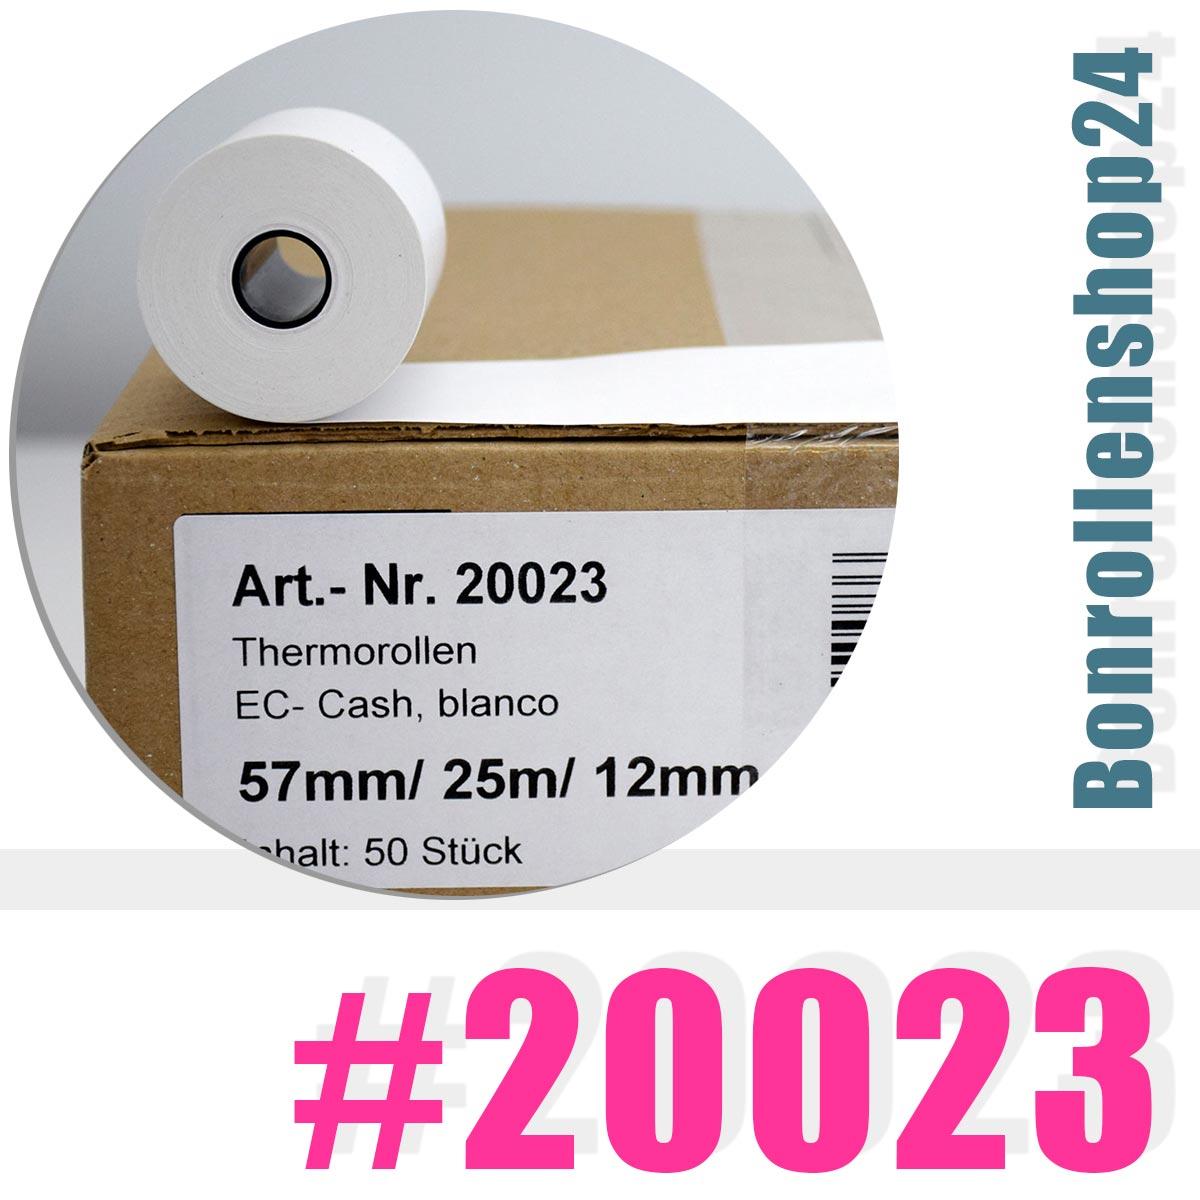 20 EC-Cash Thermo Rollen für Ingenico I7770 I7301 I5310